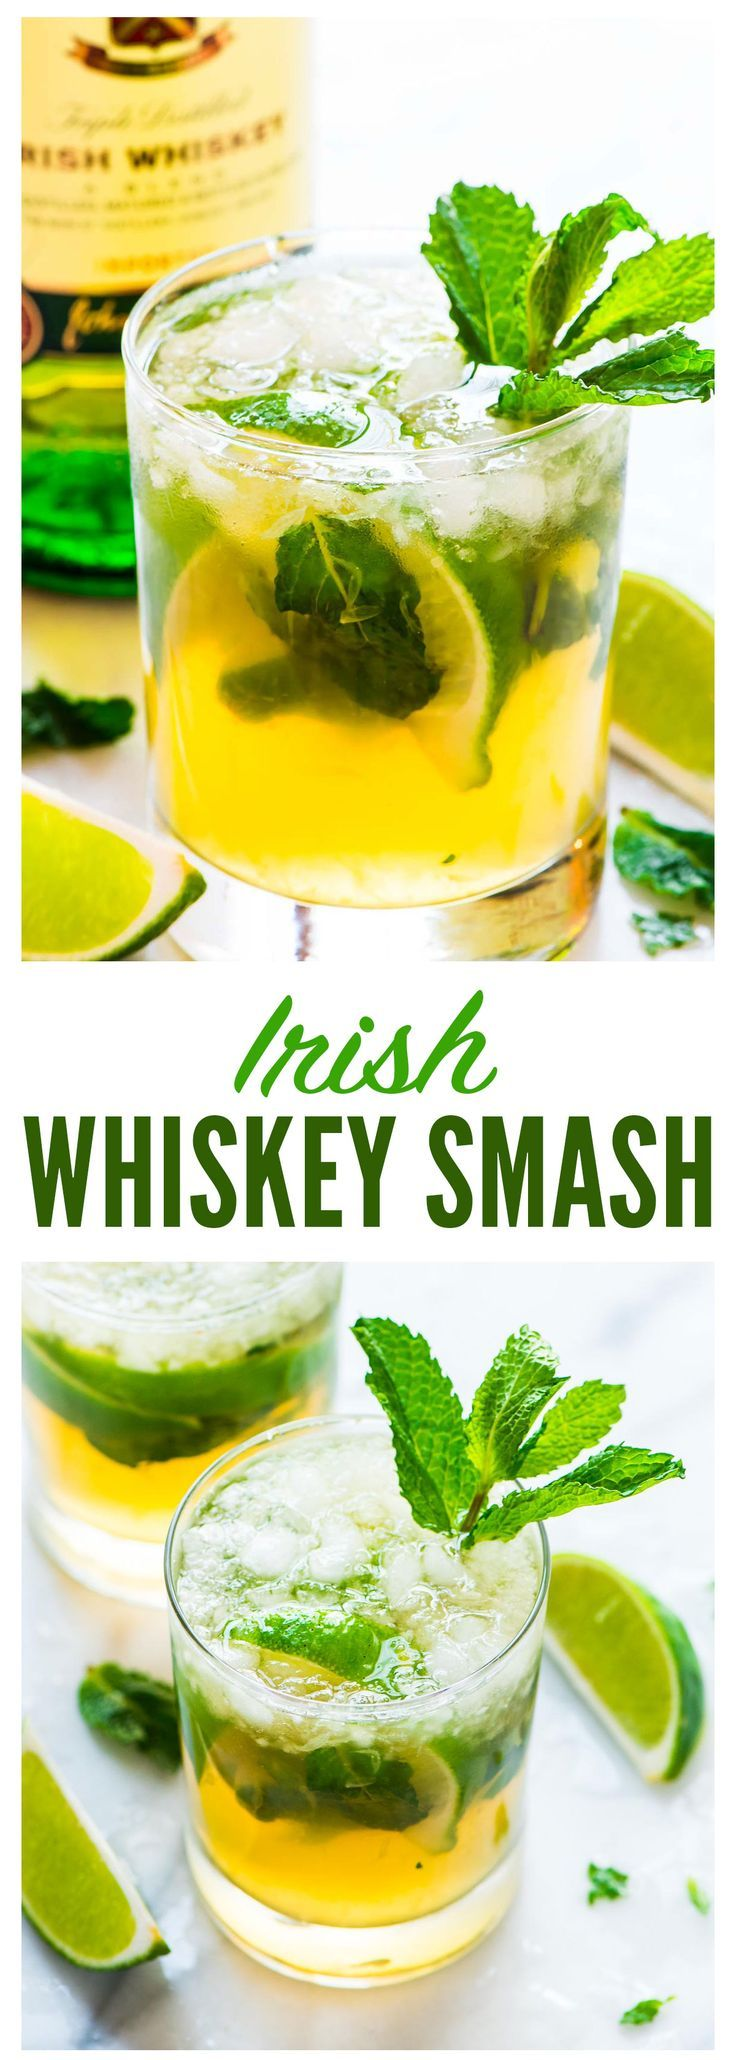 Photo of Green Whiskey Smash